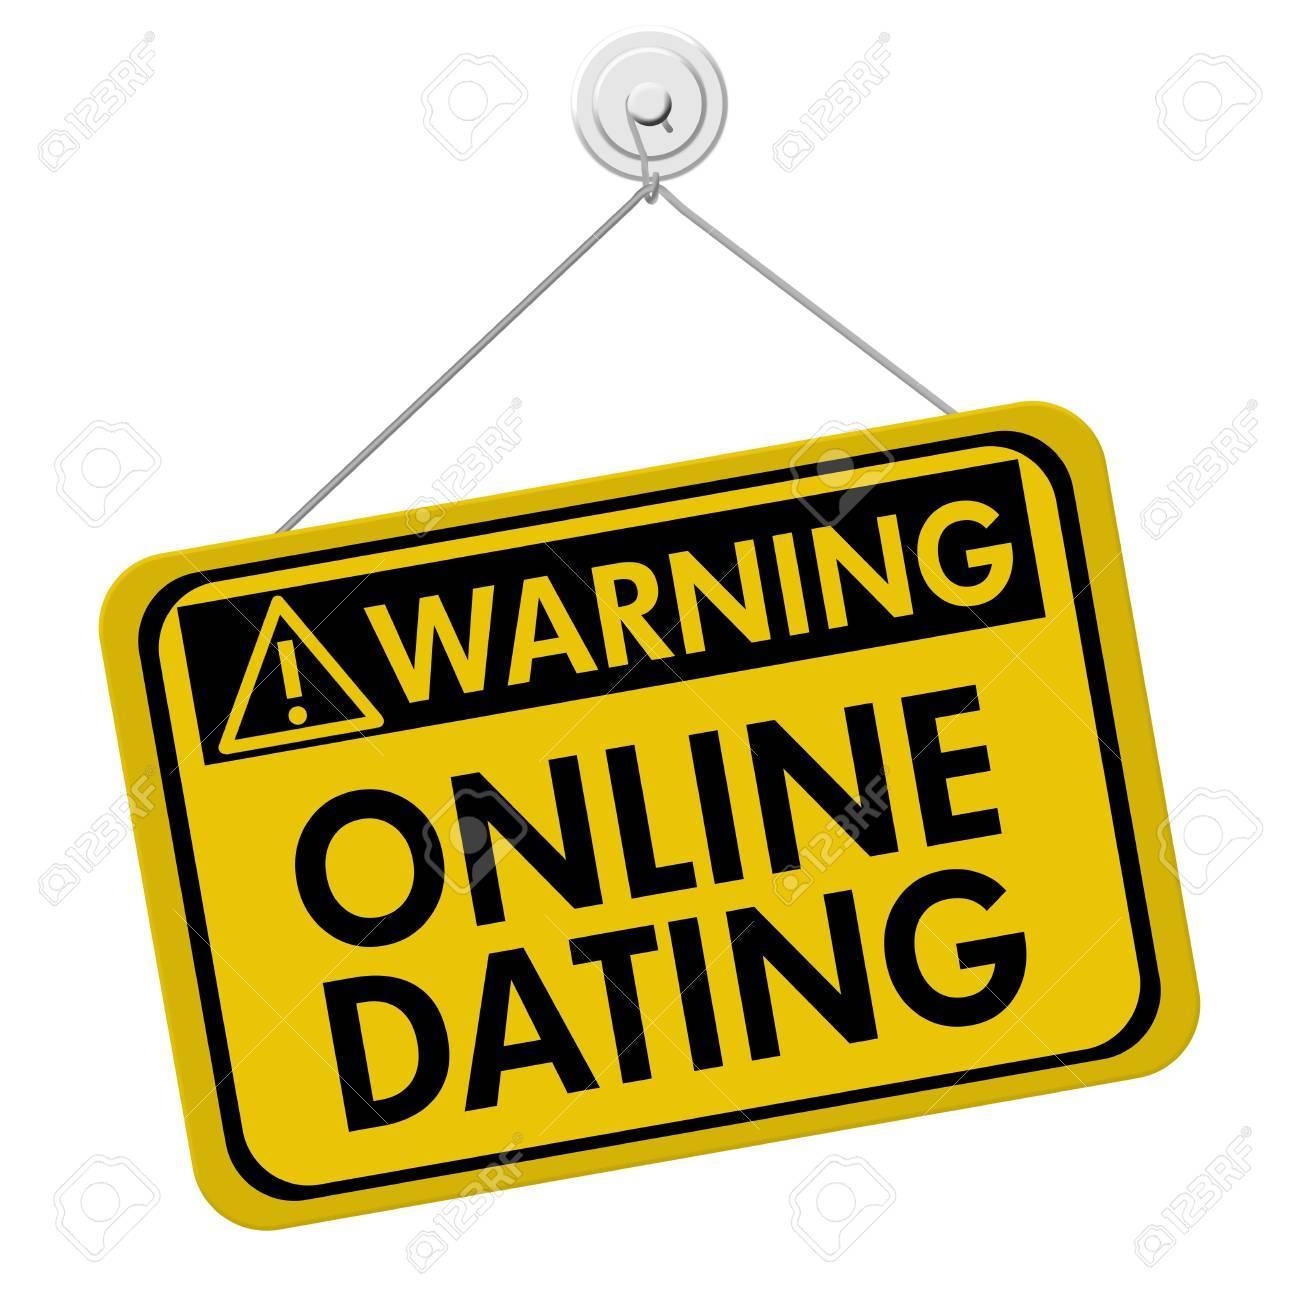 meerval online dating